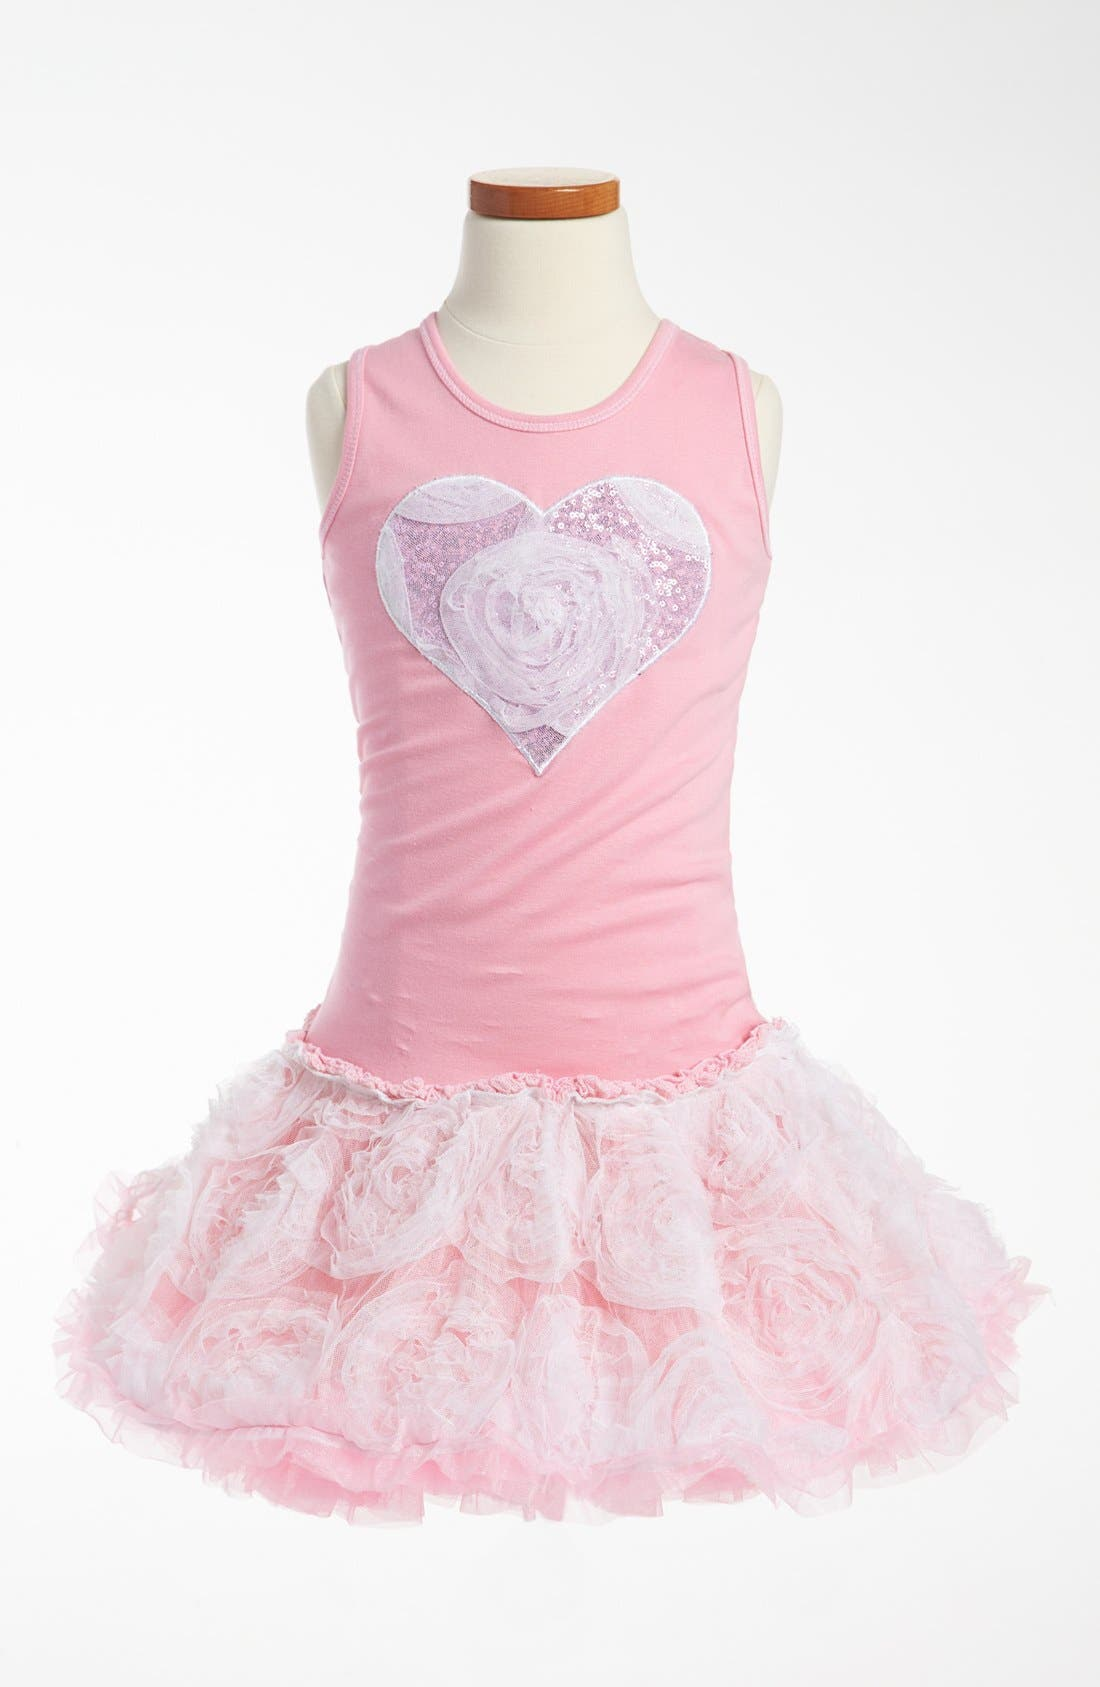 Main Image - Ooh! La, La! Couture Tulle Flower Dress (Little Girls & Big Girls)